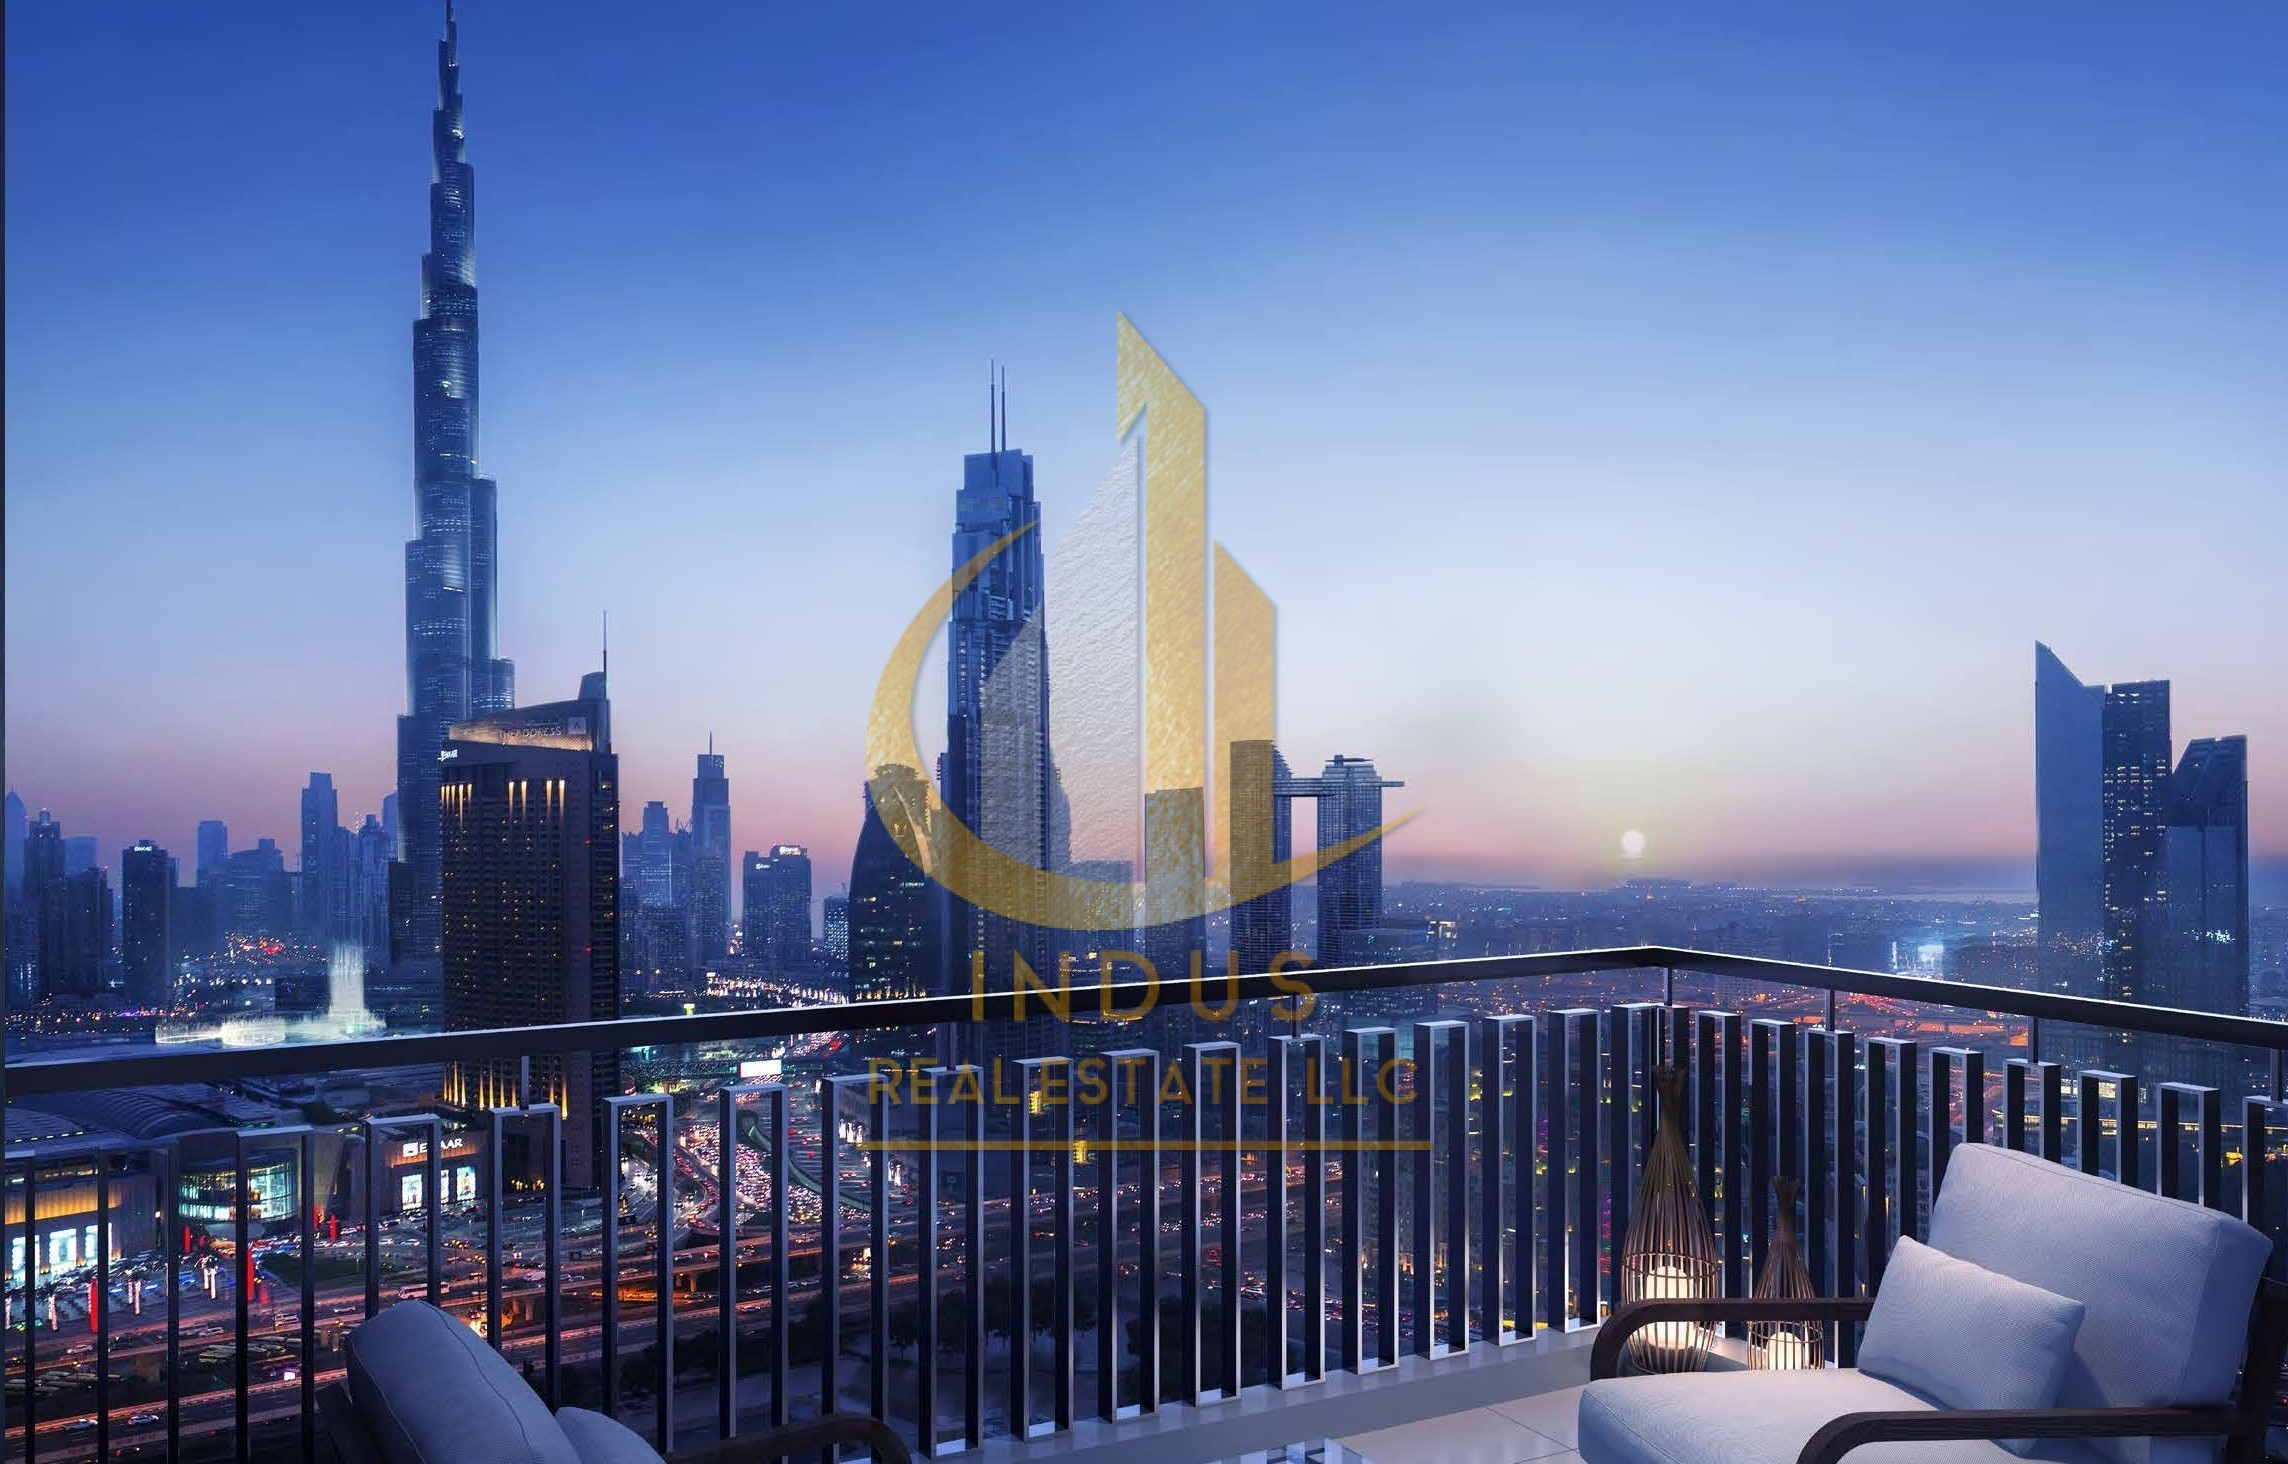 StaySafe| The View Says It All |Burj Khalifa View